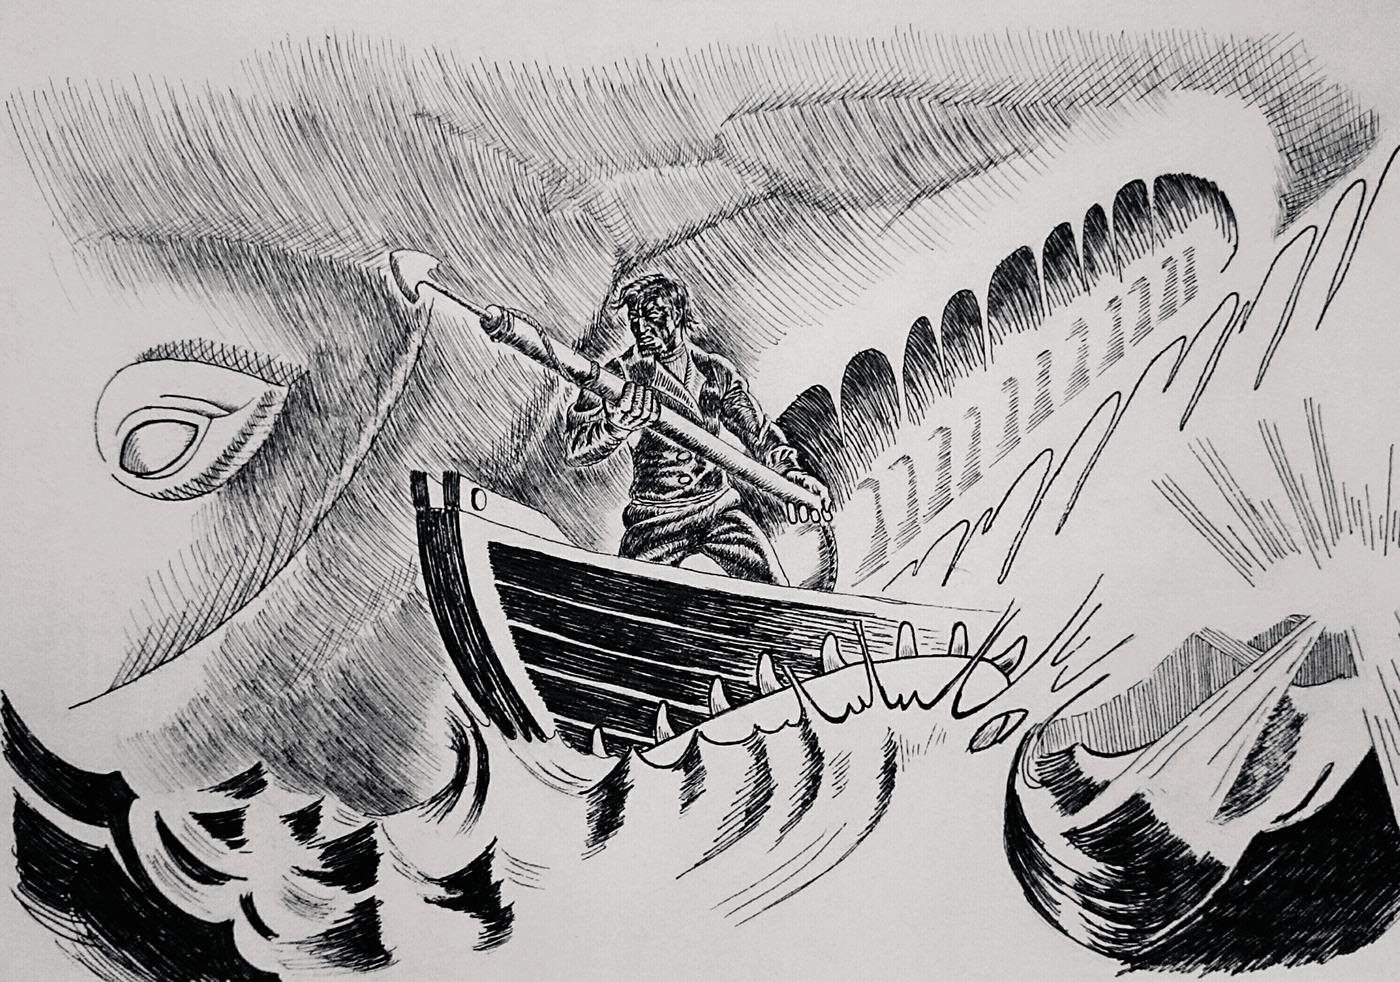 sergio leone charles bronson heavy metal Judas Priest Moby Dick